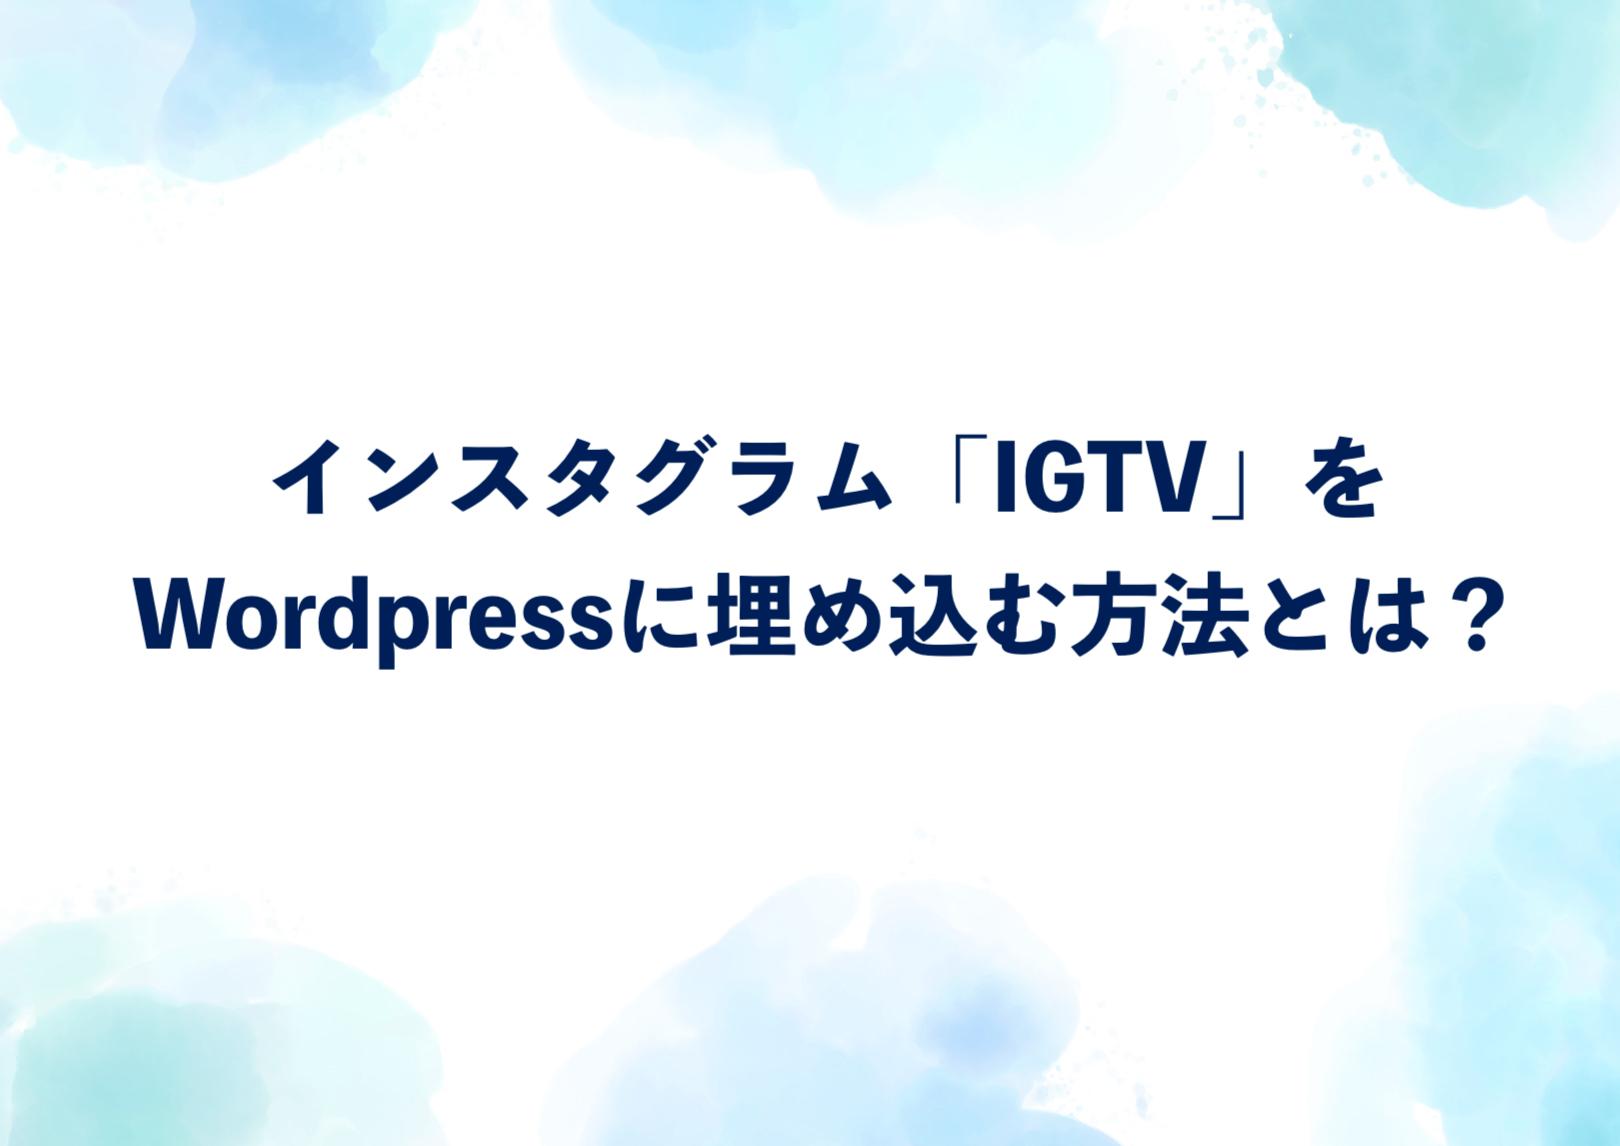 IGTVWordpress